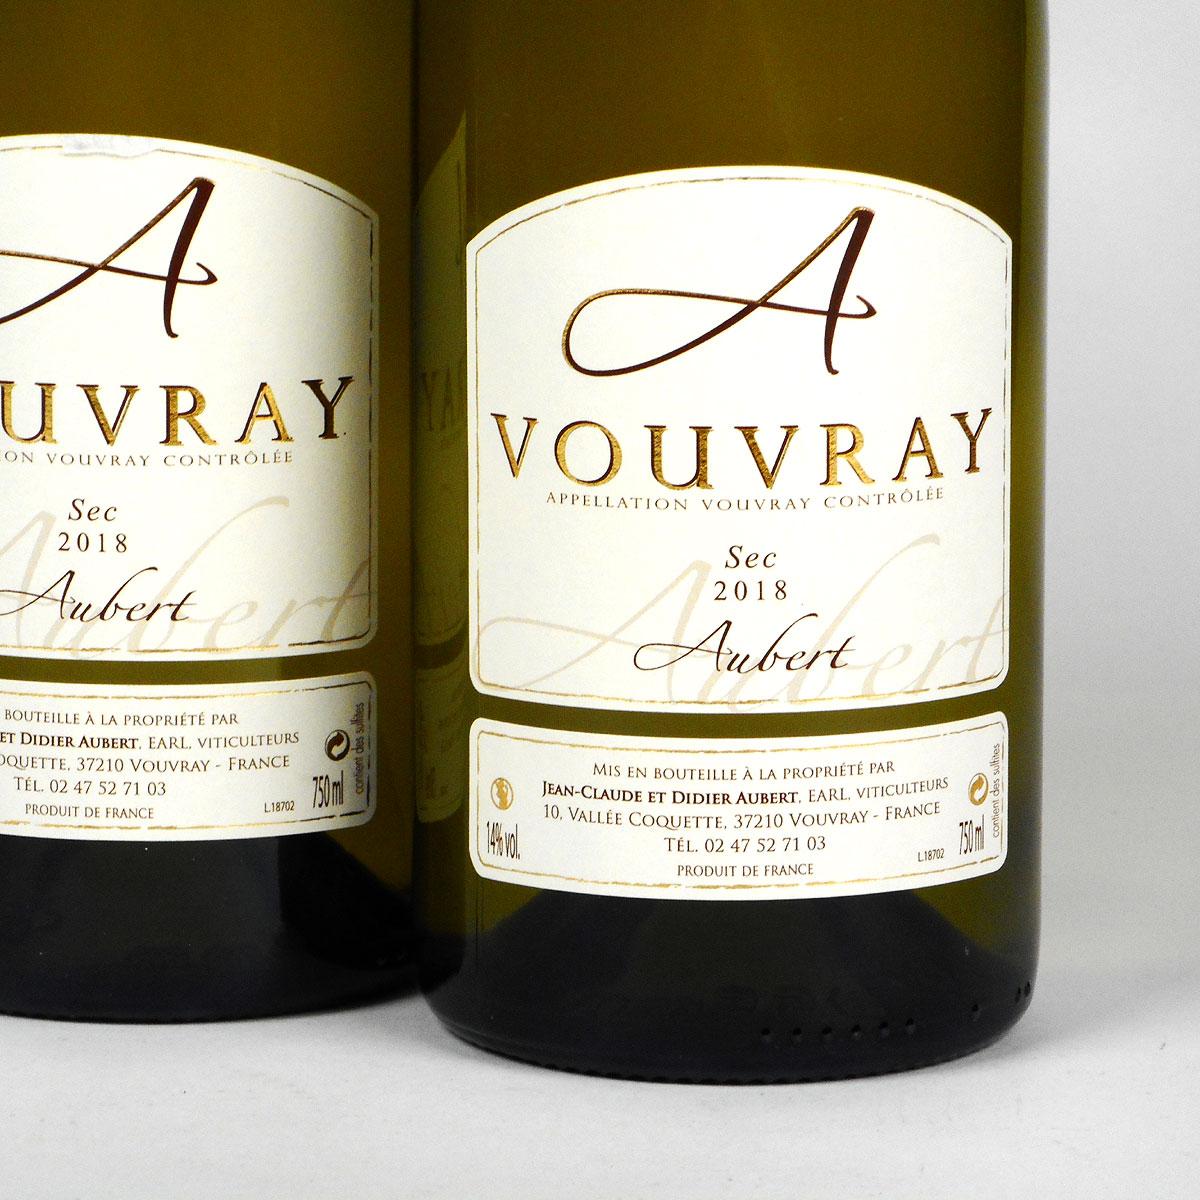 Vouvray: Jean-Claude & Didier Aubert Sec 2018